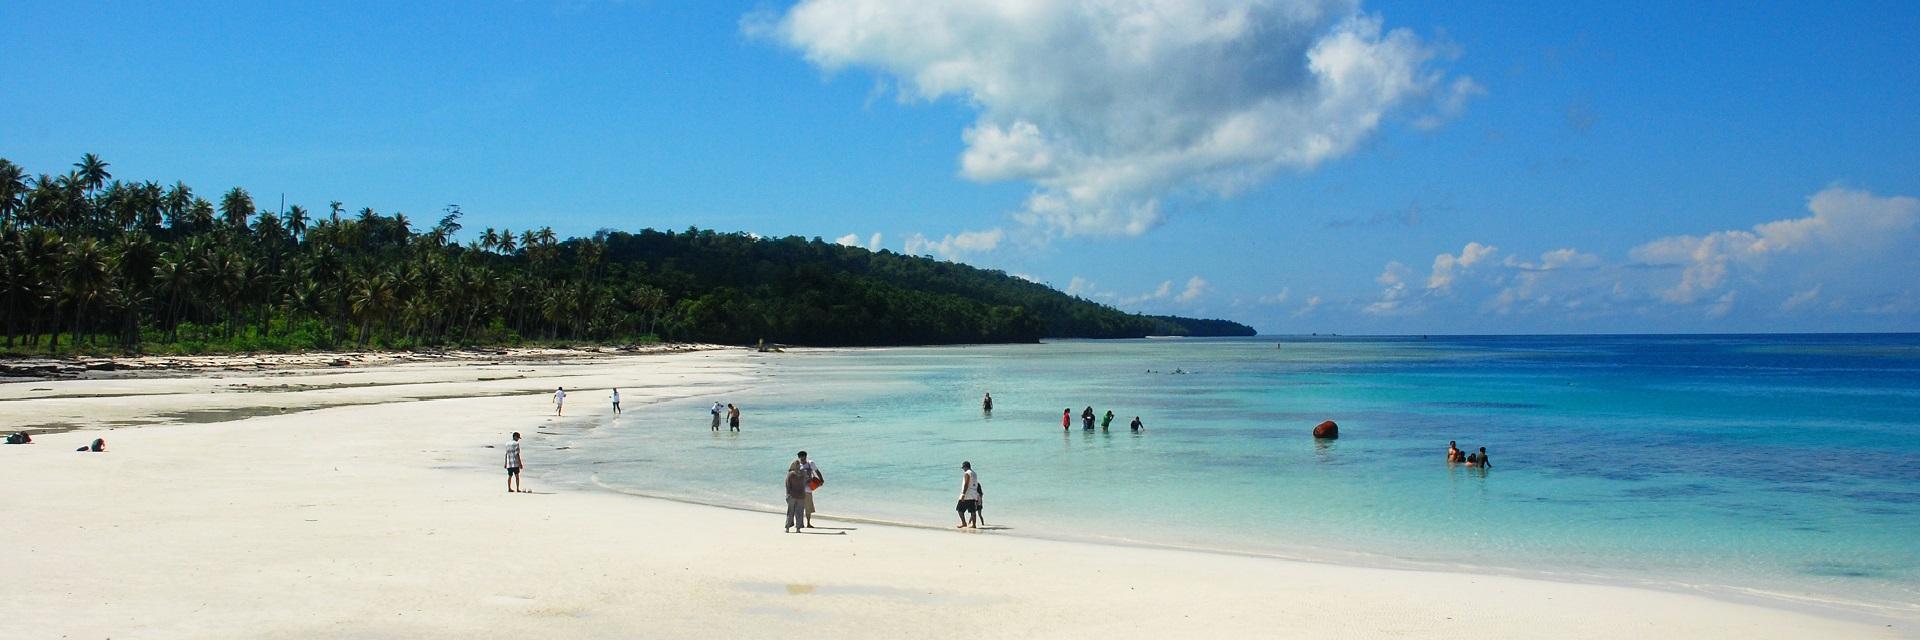 Pantai Wedi Putih via ELFIDA LUBIS Pantai Wedi Putih - Dolan Dolen